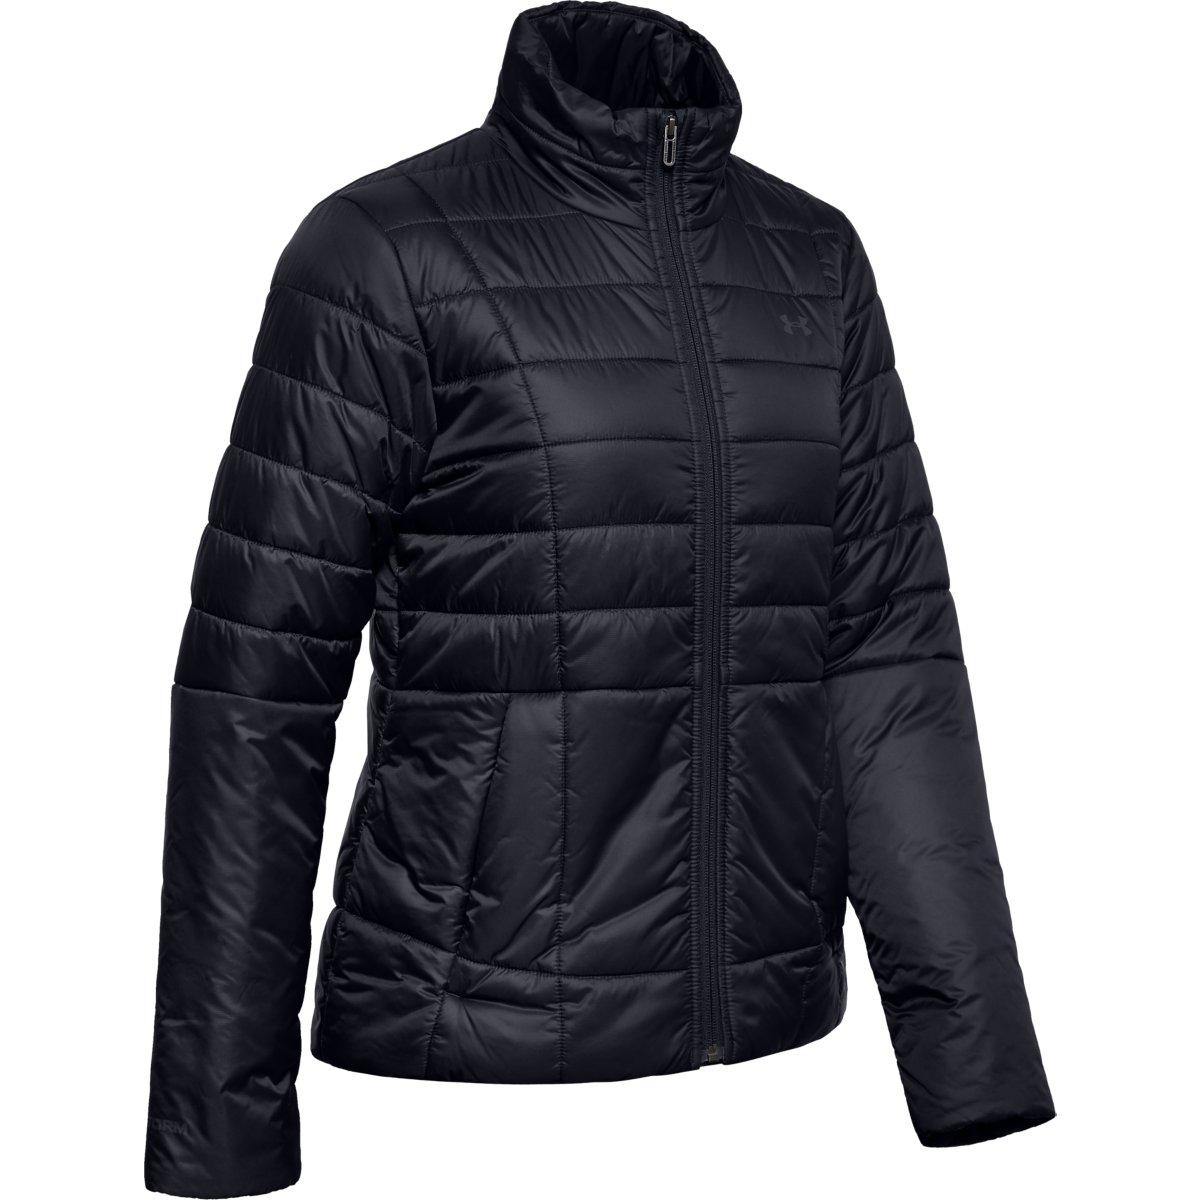 Bunda Under Armour Insulated Jacket-Blk